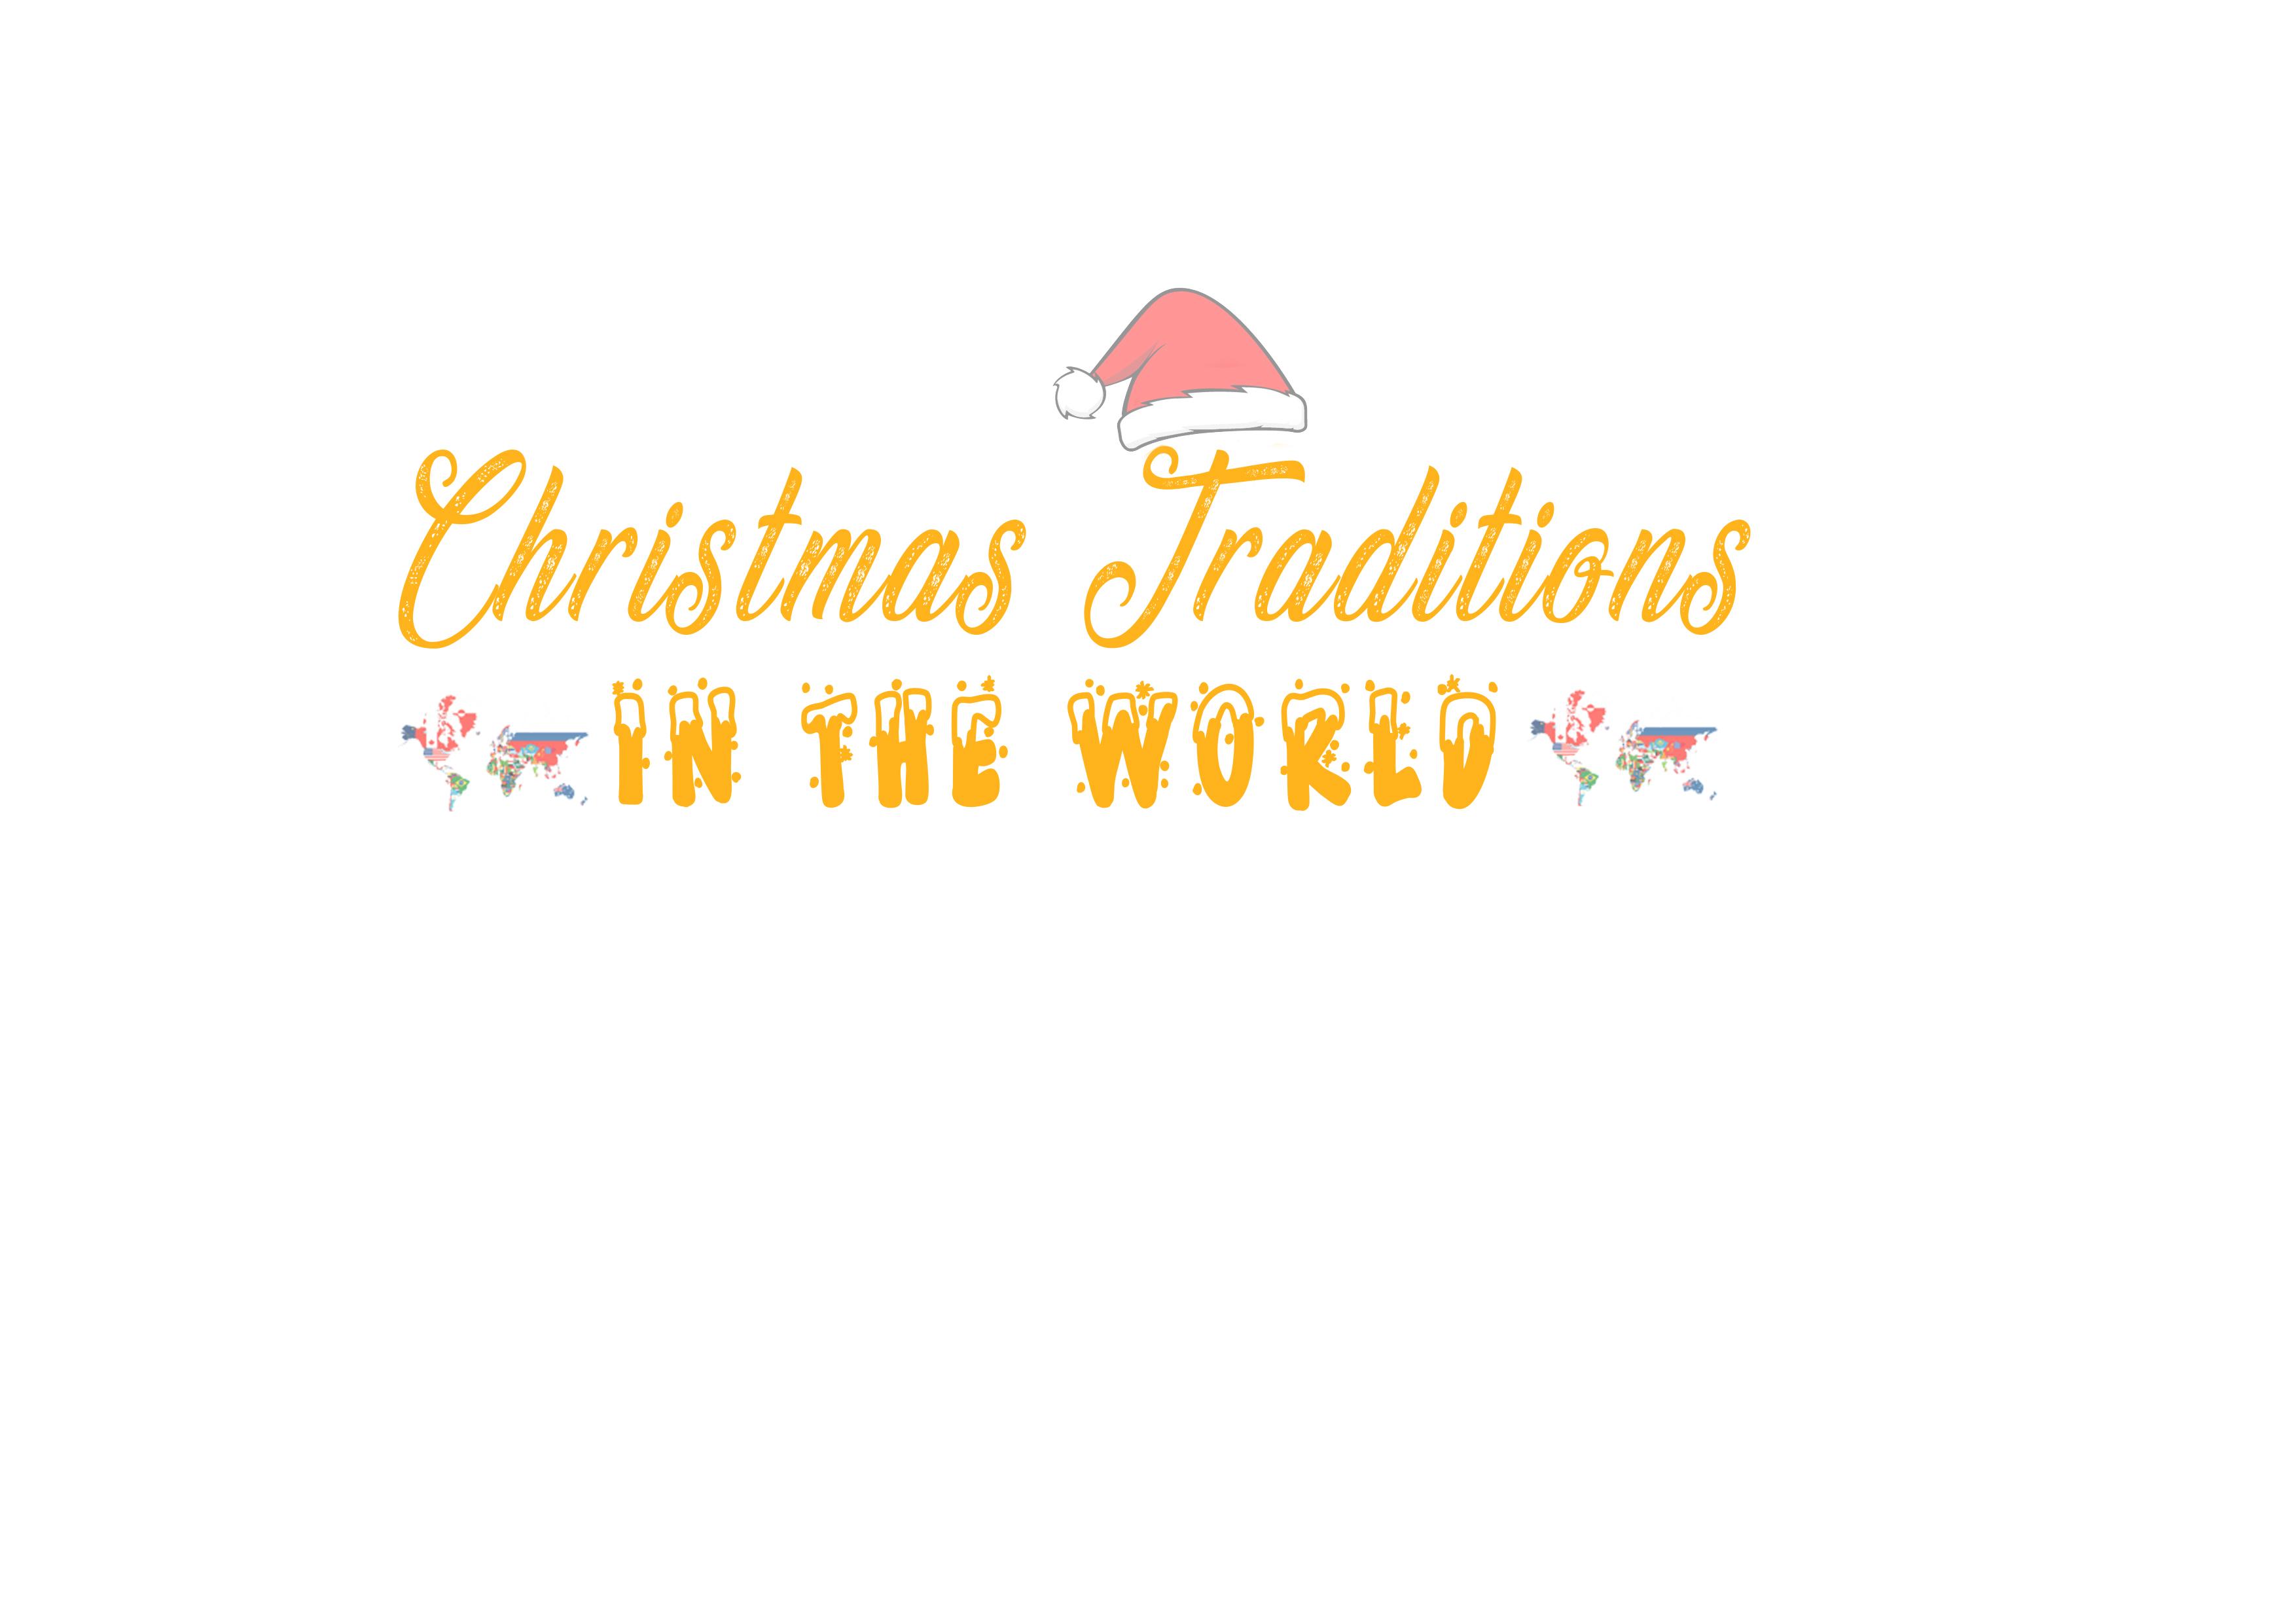 """Christmas Traditions in the World"" il mood del Natale 2018 a Santa Marinella"